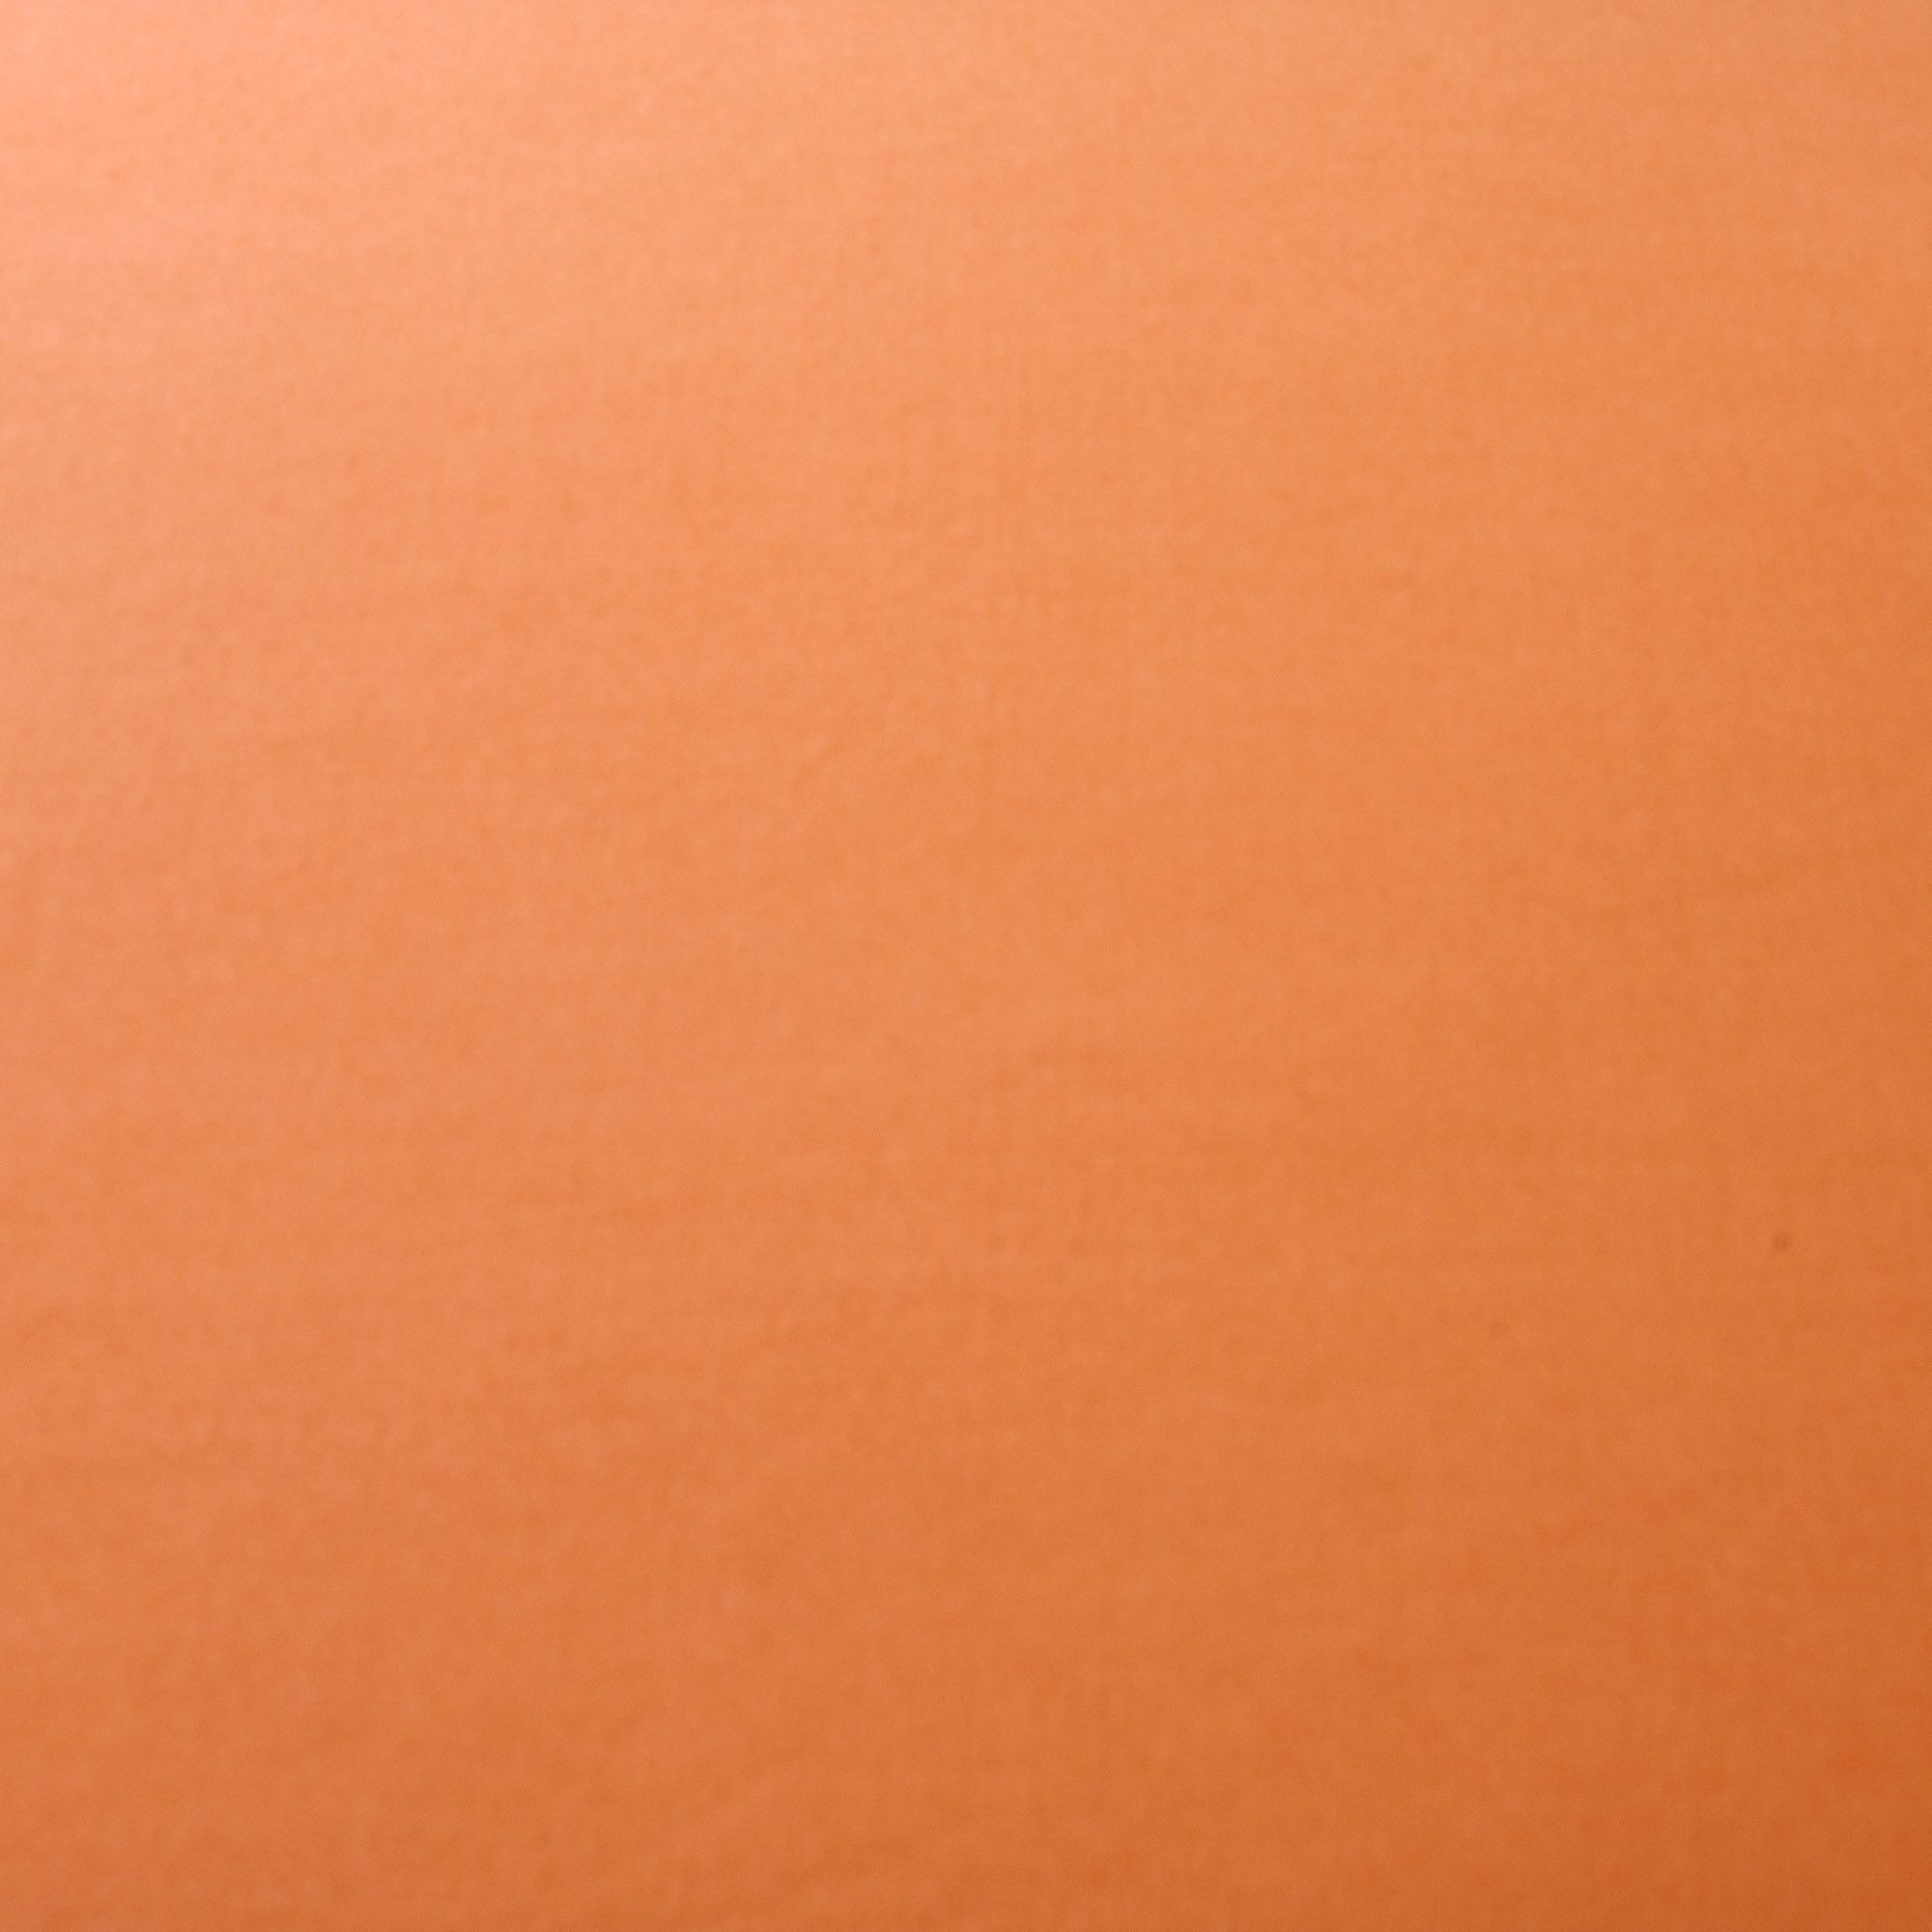 Tecido Malha Helanca Light Cenoura 100% Poliester 1,80 mt Largura